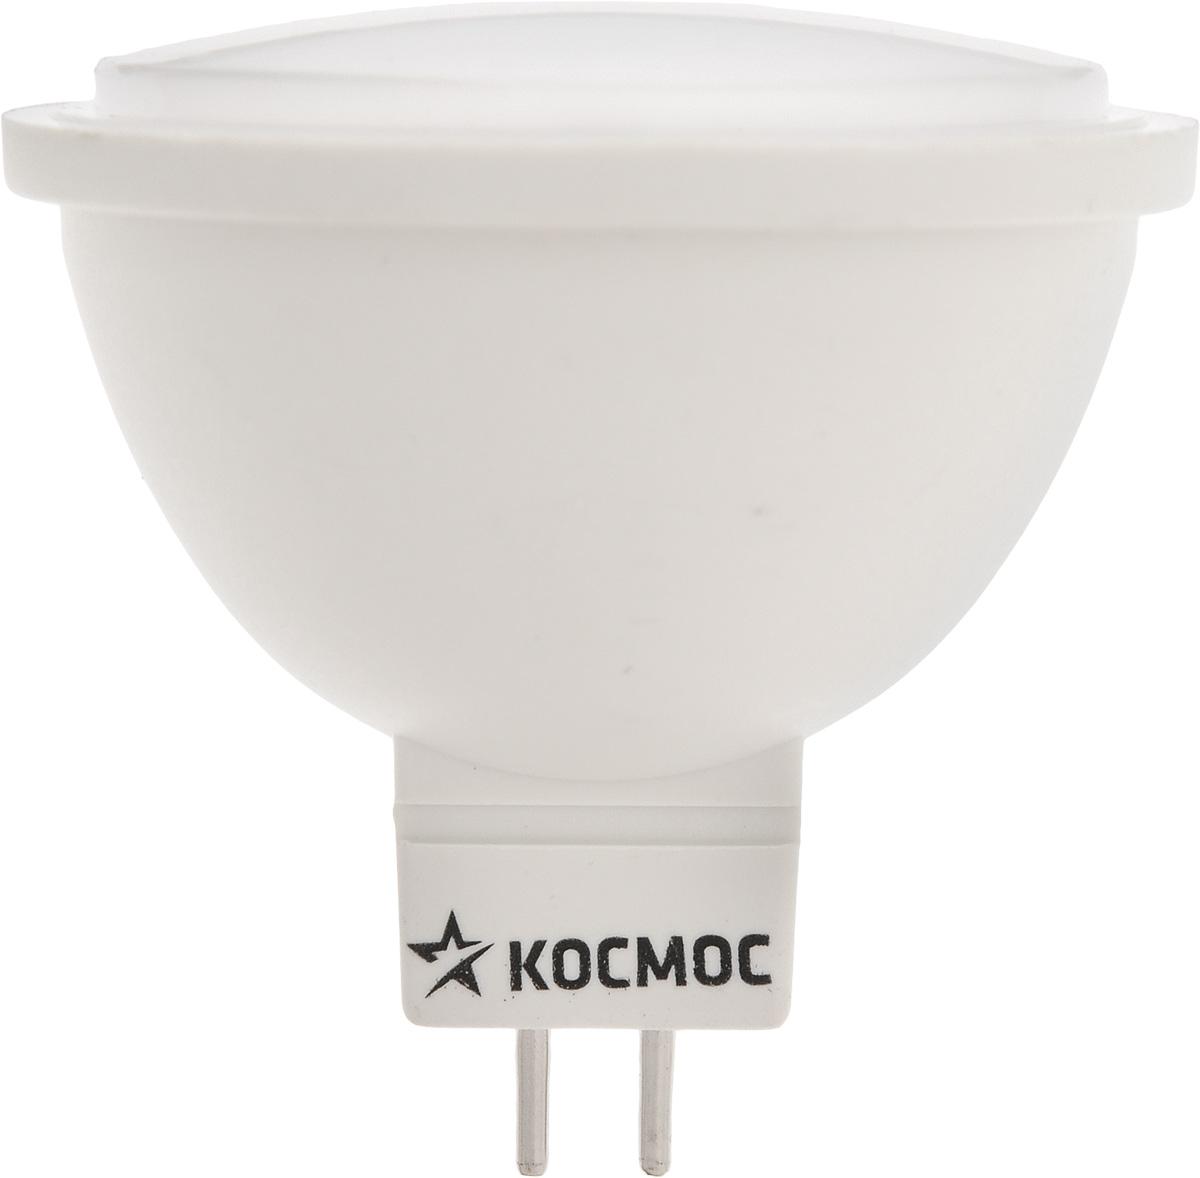 Светодиодная лампа Kosmos, теплый свет, цоколь GU5.3, 7W, 220V